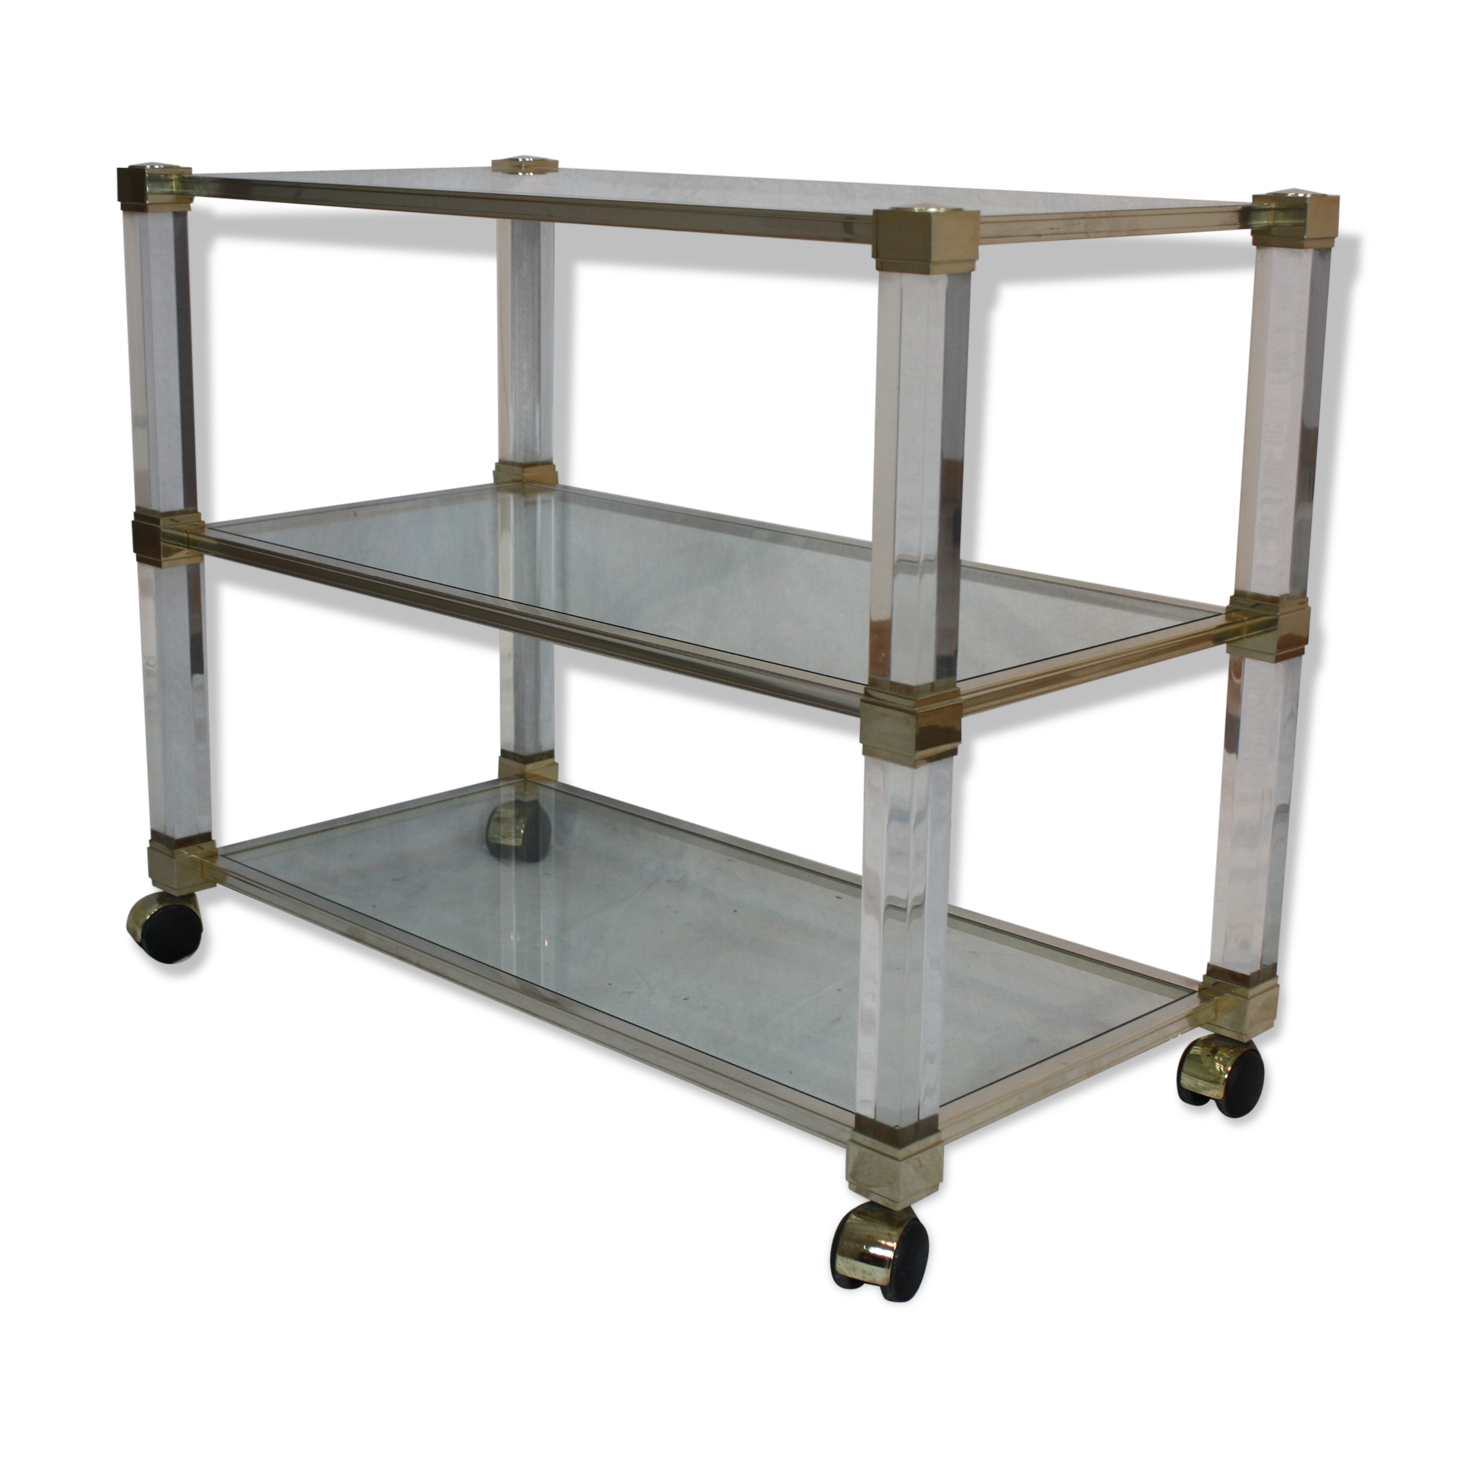 cheap desserte bar roulant pierre vandel paris with bar roulant de jardin. Black Bedroom Furniture Sets. Home Design Ideas